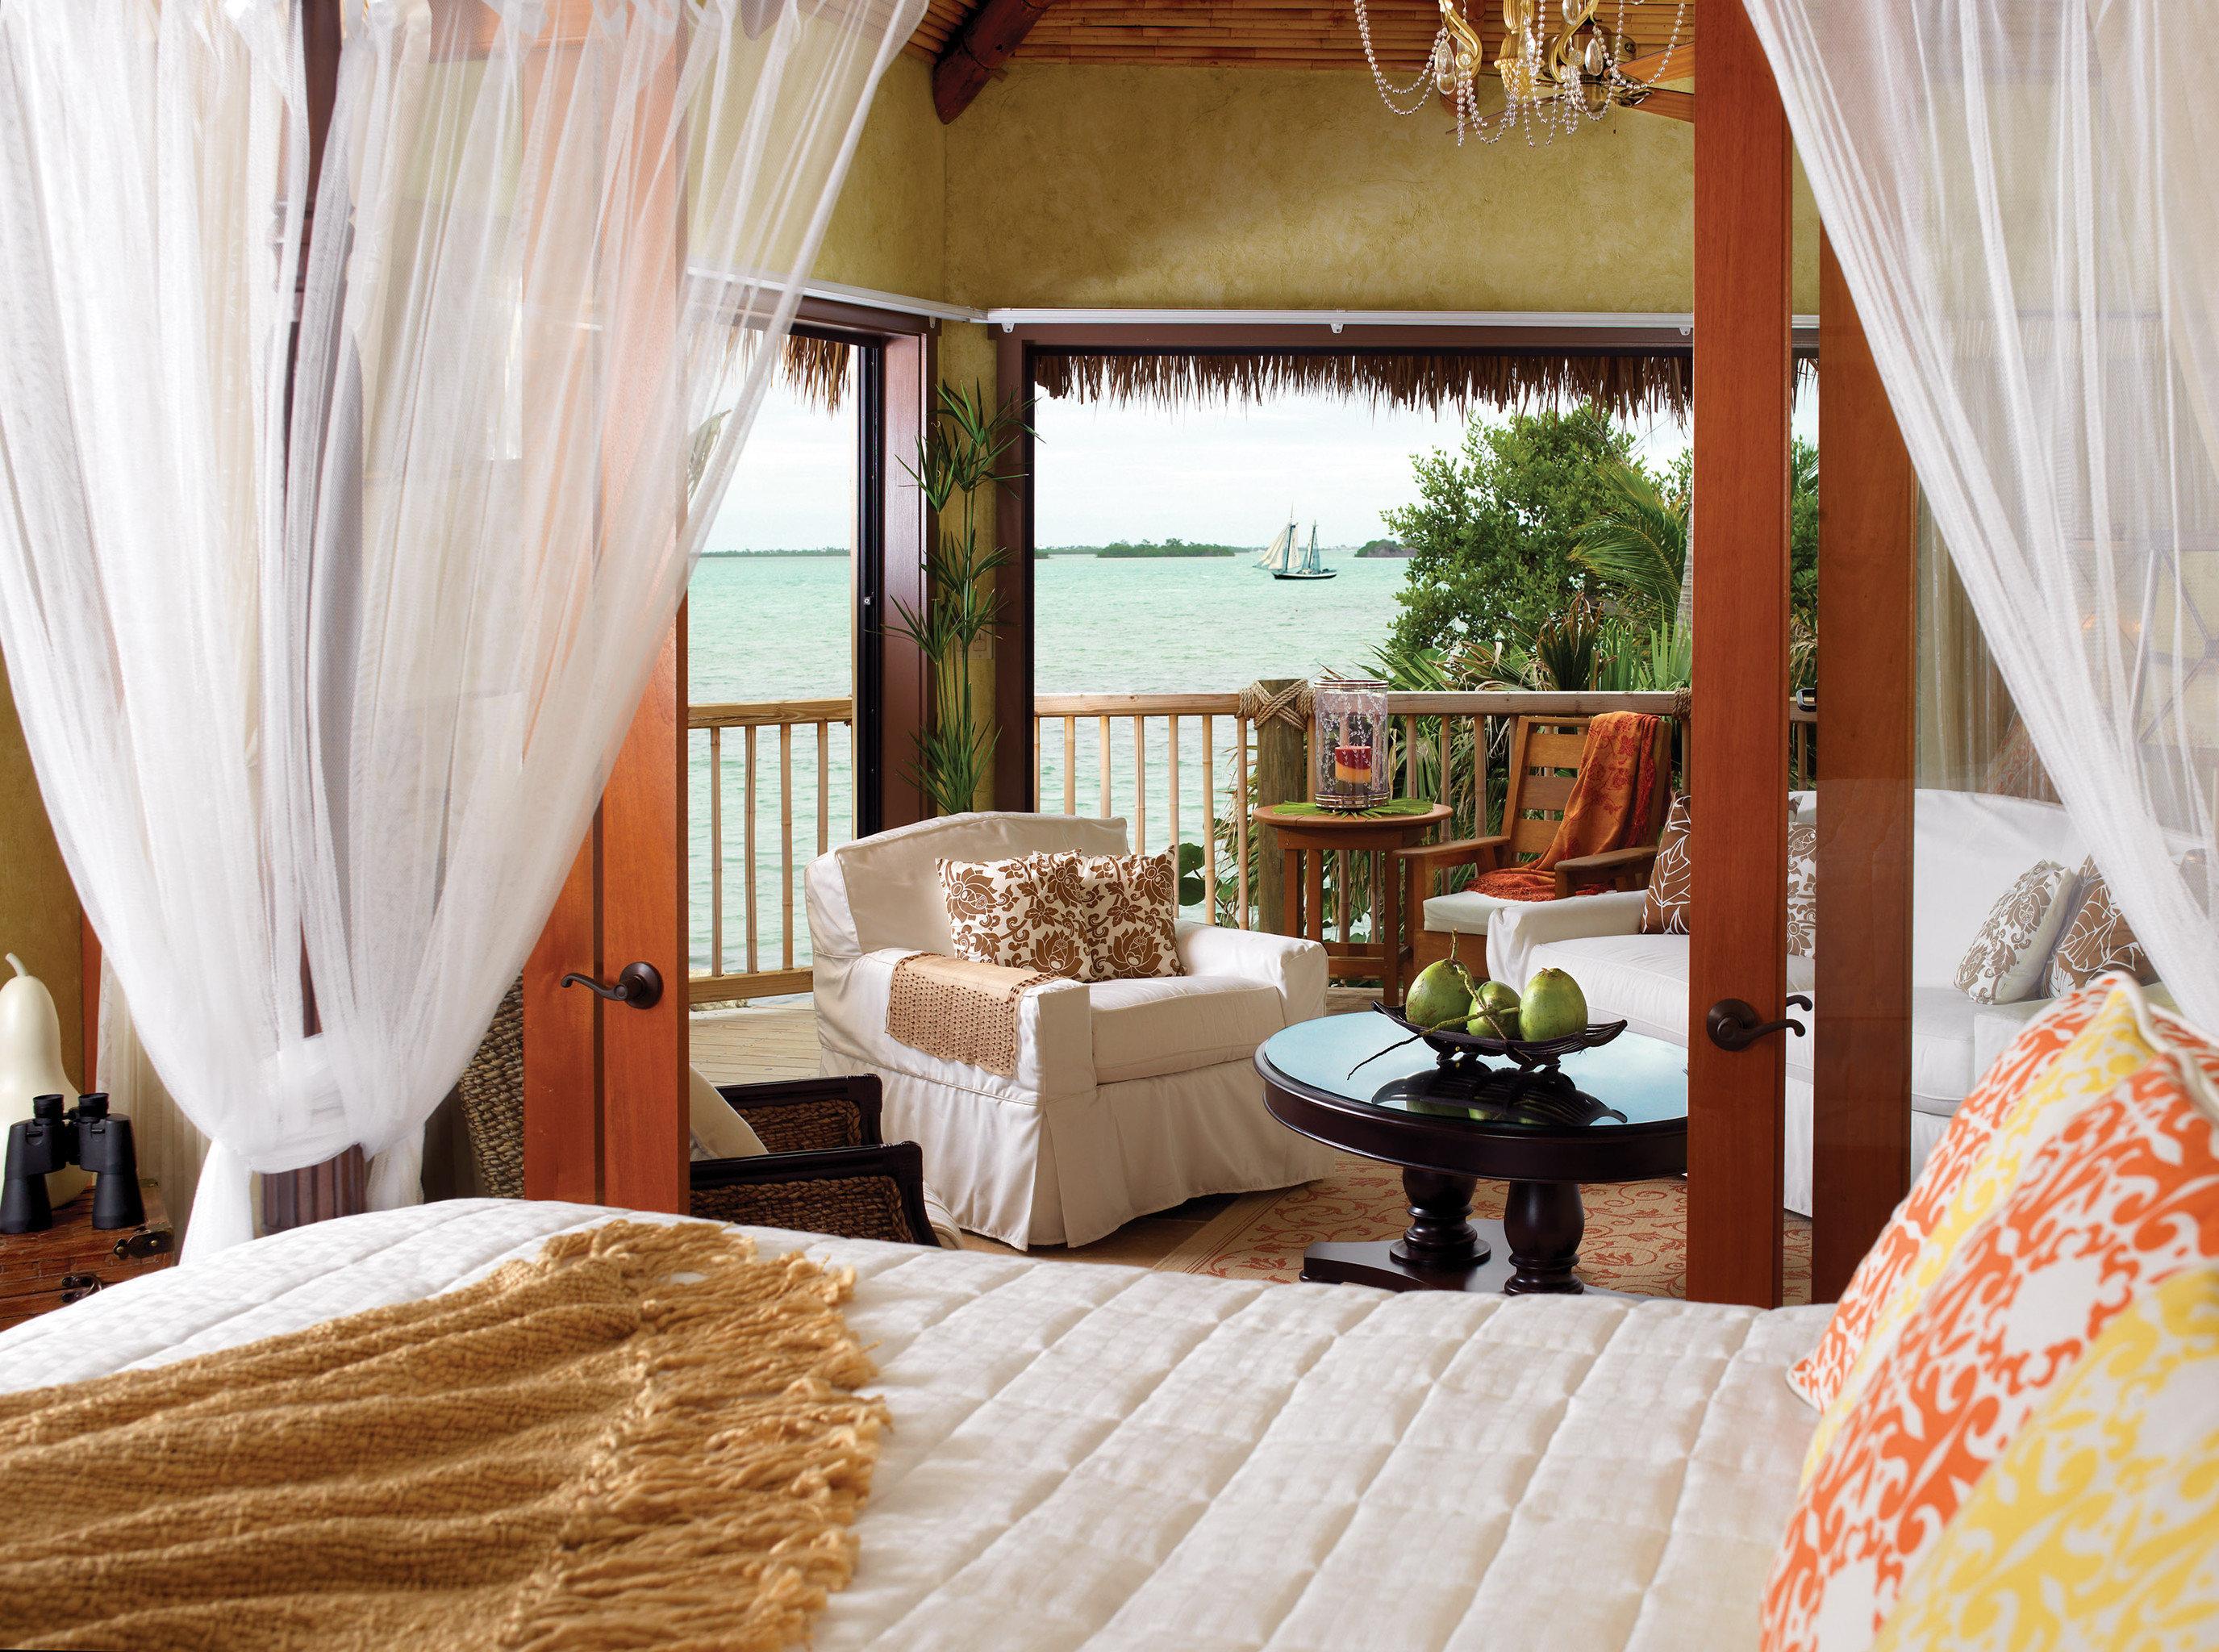 The 10 Best Beach Resorts In Florida